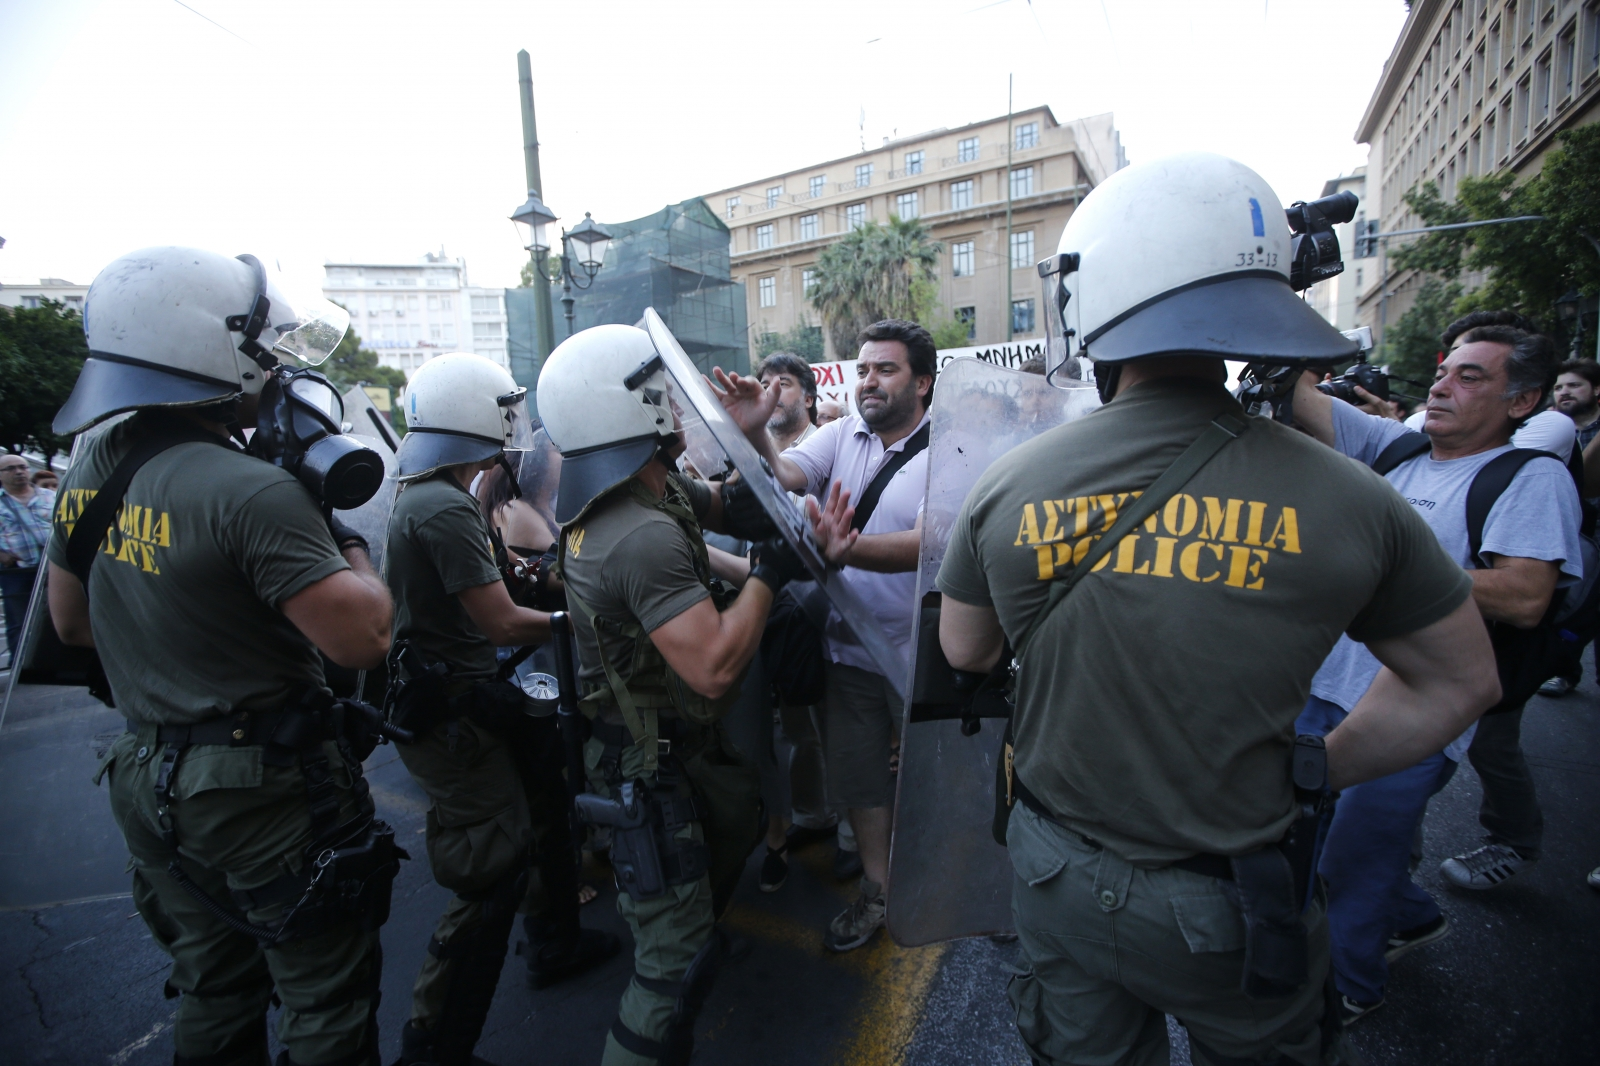 Anti-austerity protestors in Athens